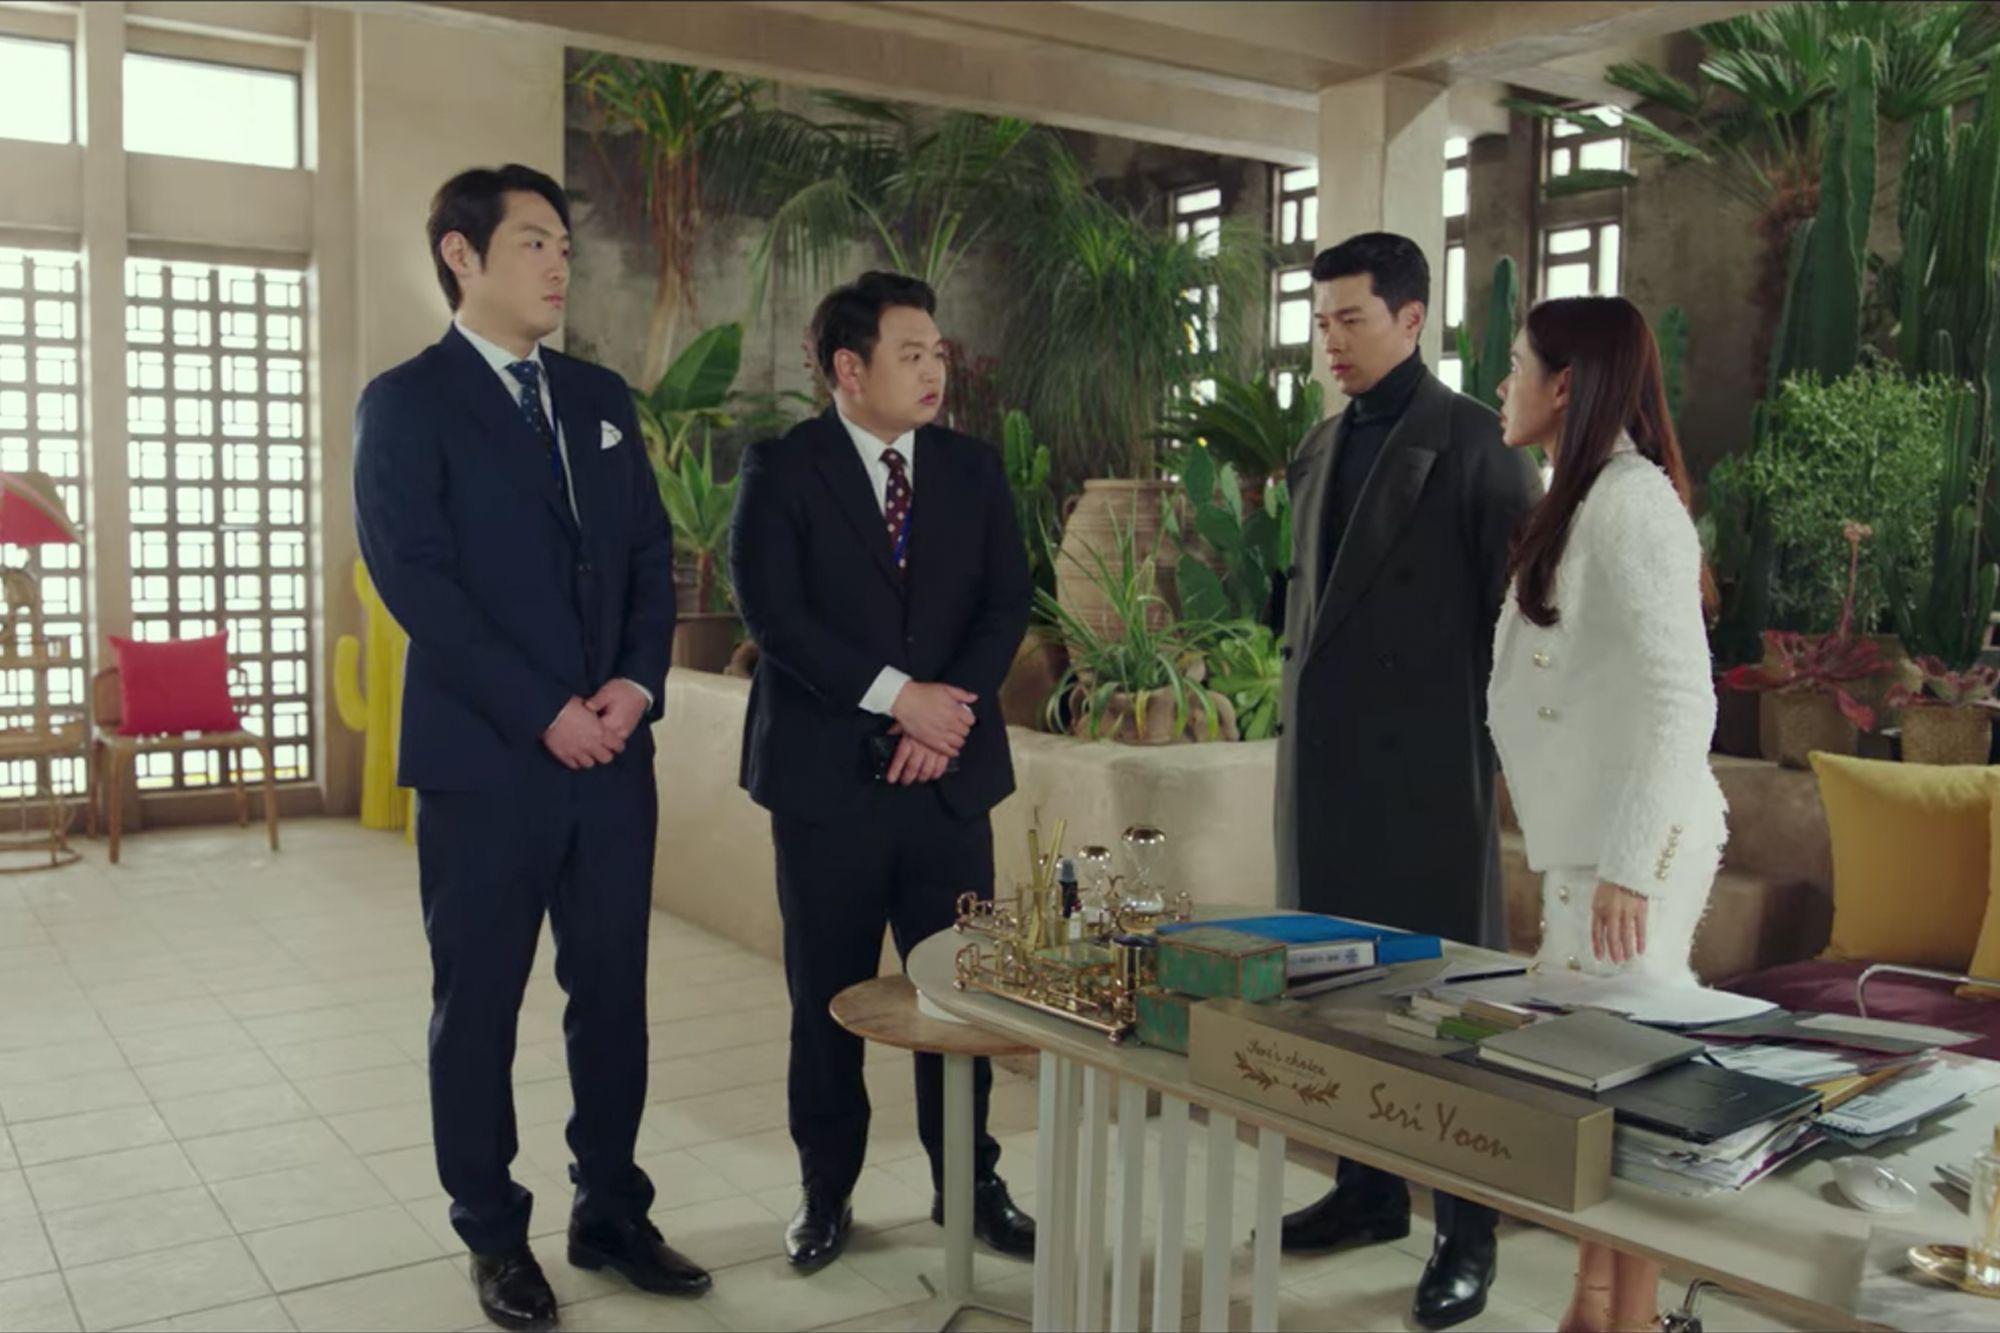 Yoon Se-ri's office in Crash Landing on You (Image: Netflix)